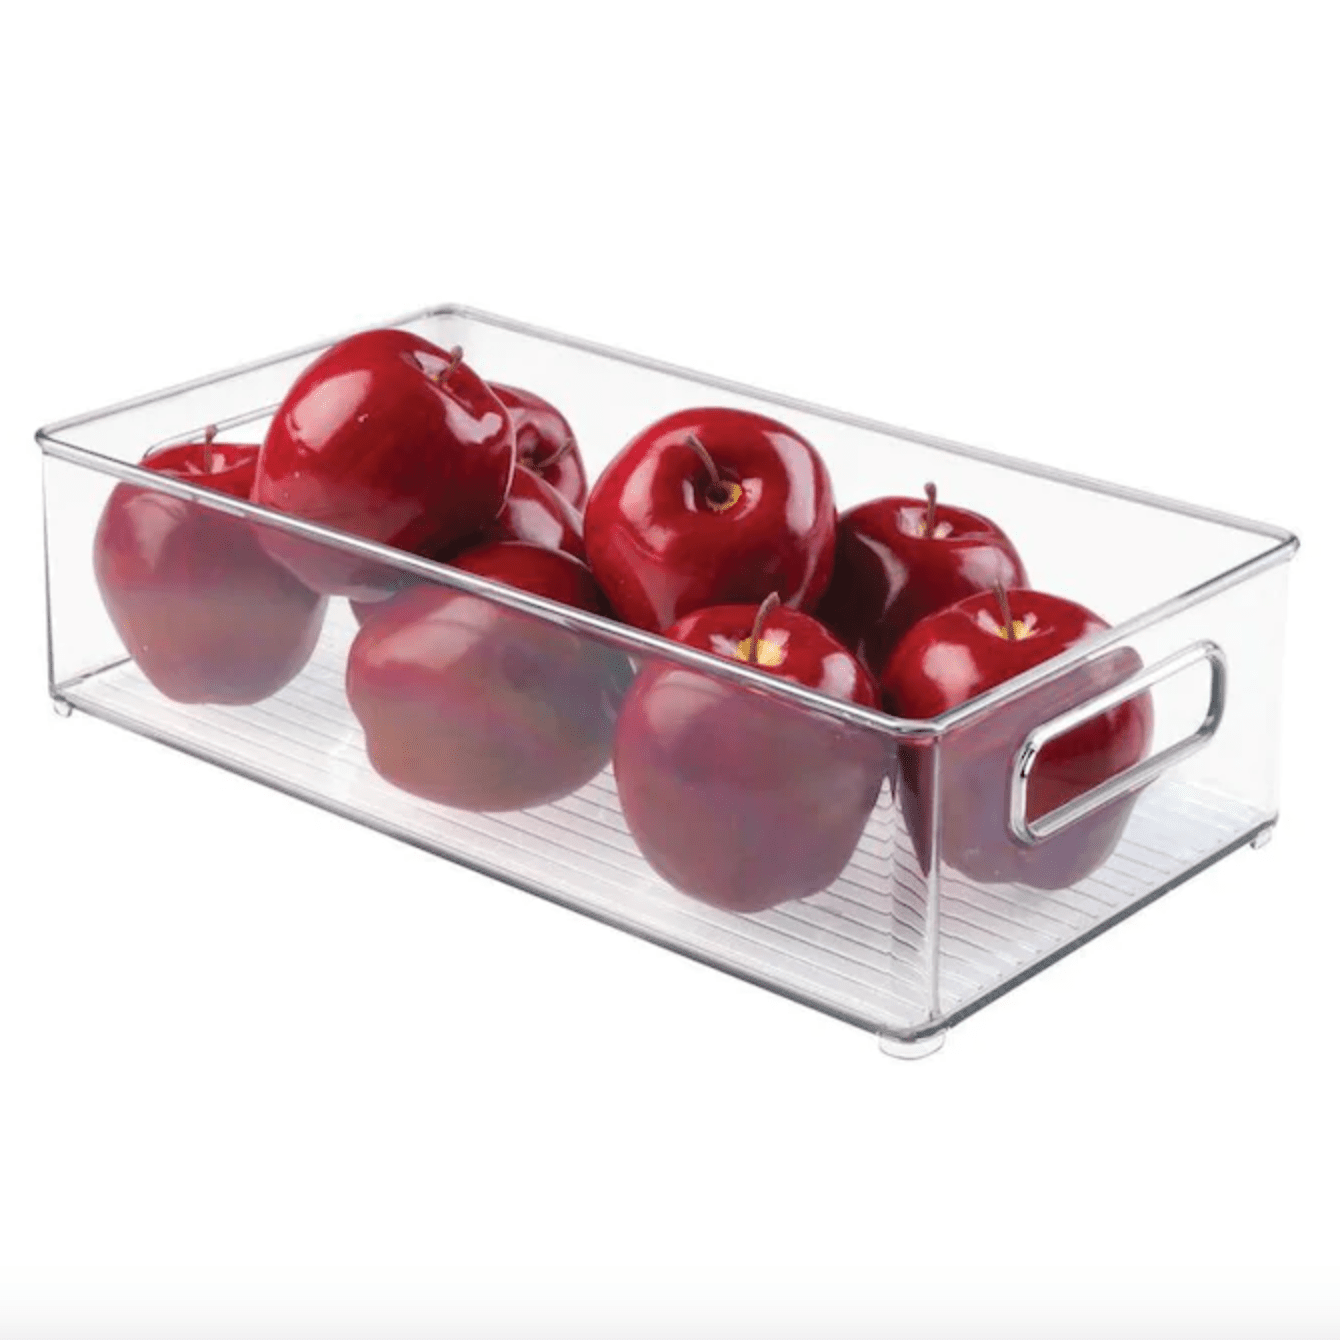 15-in x 6-in Plastic Multi-use Insert Drawer Organizer